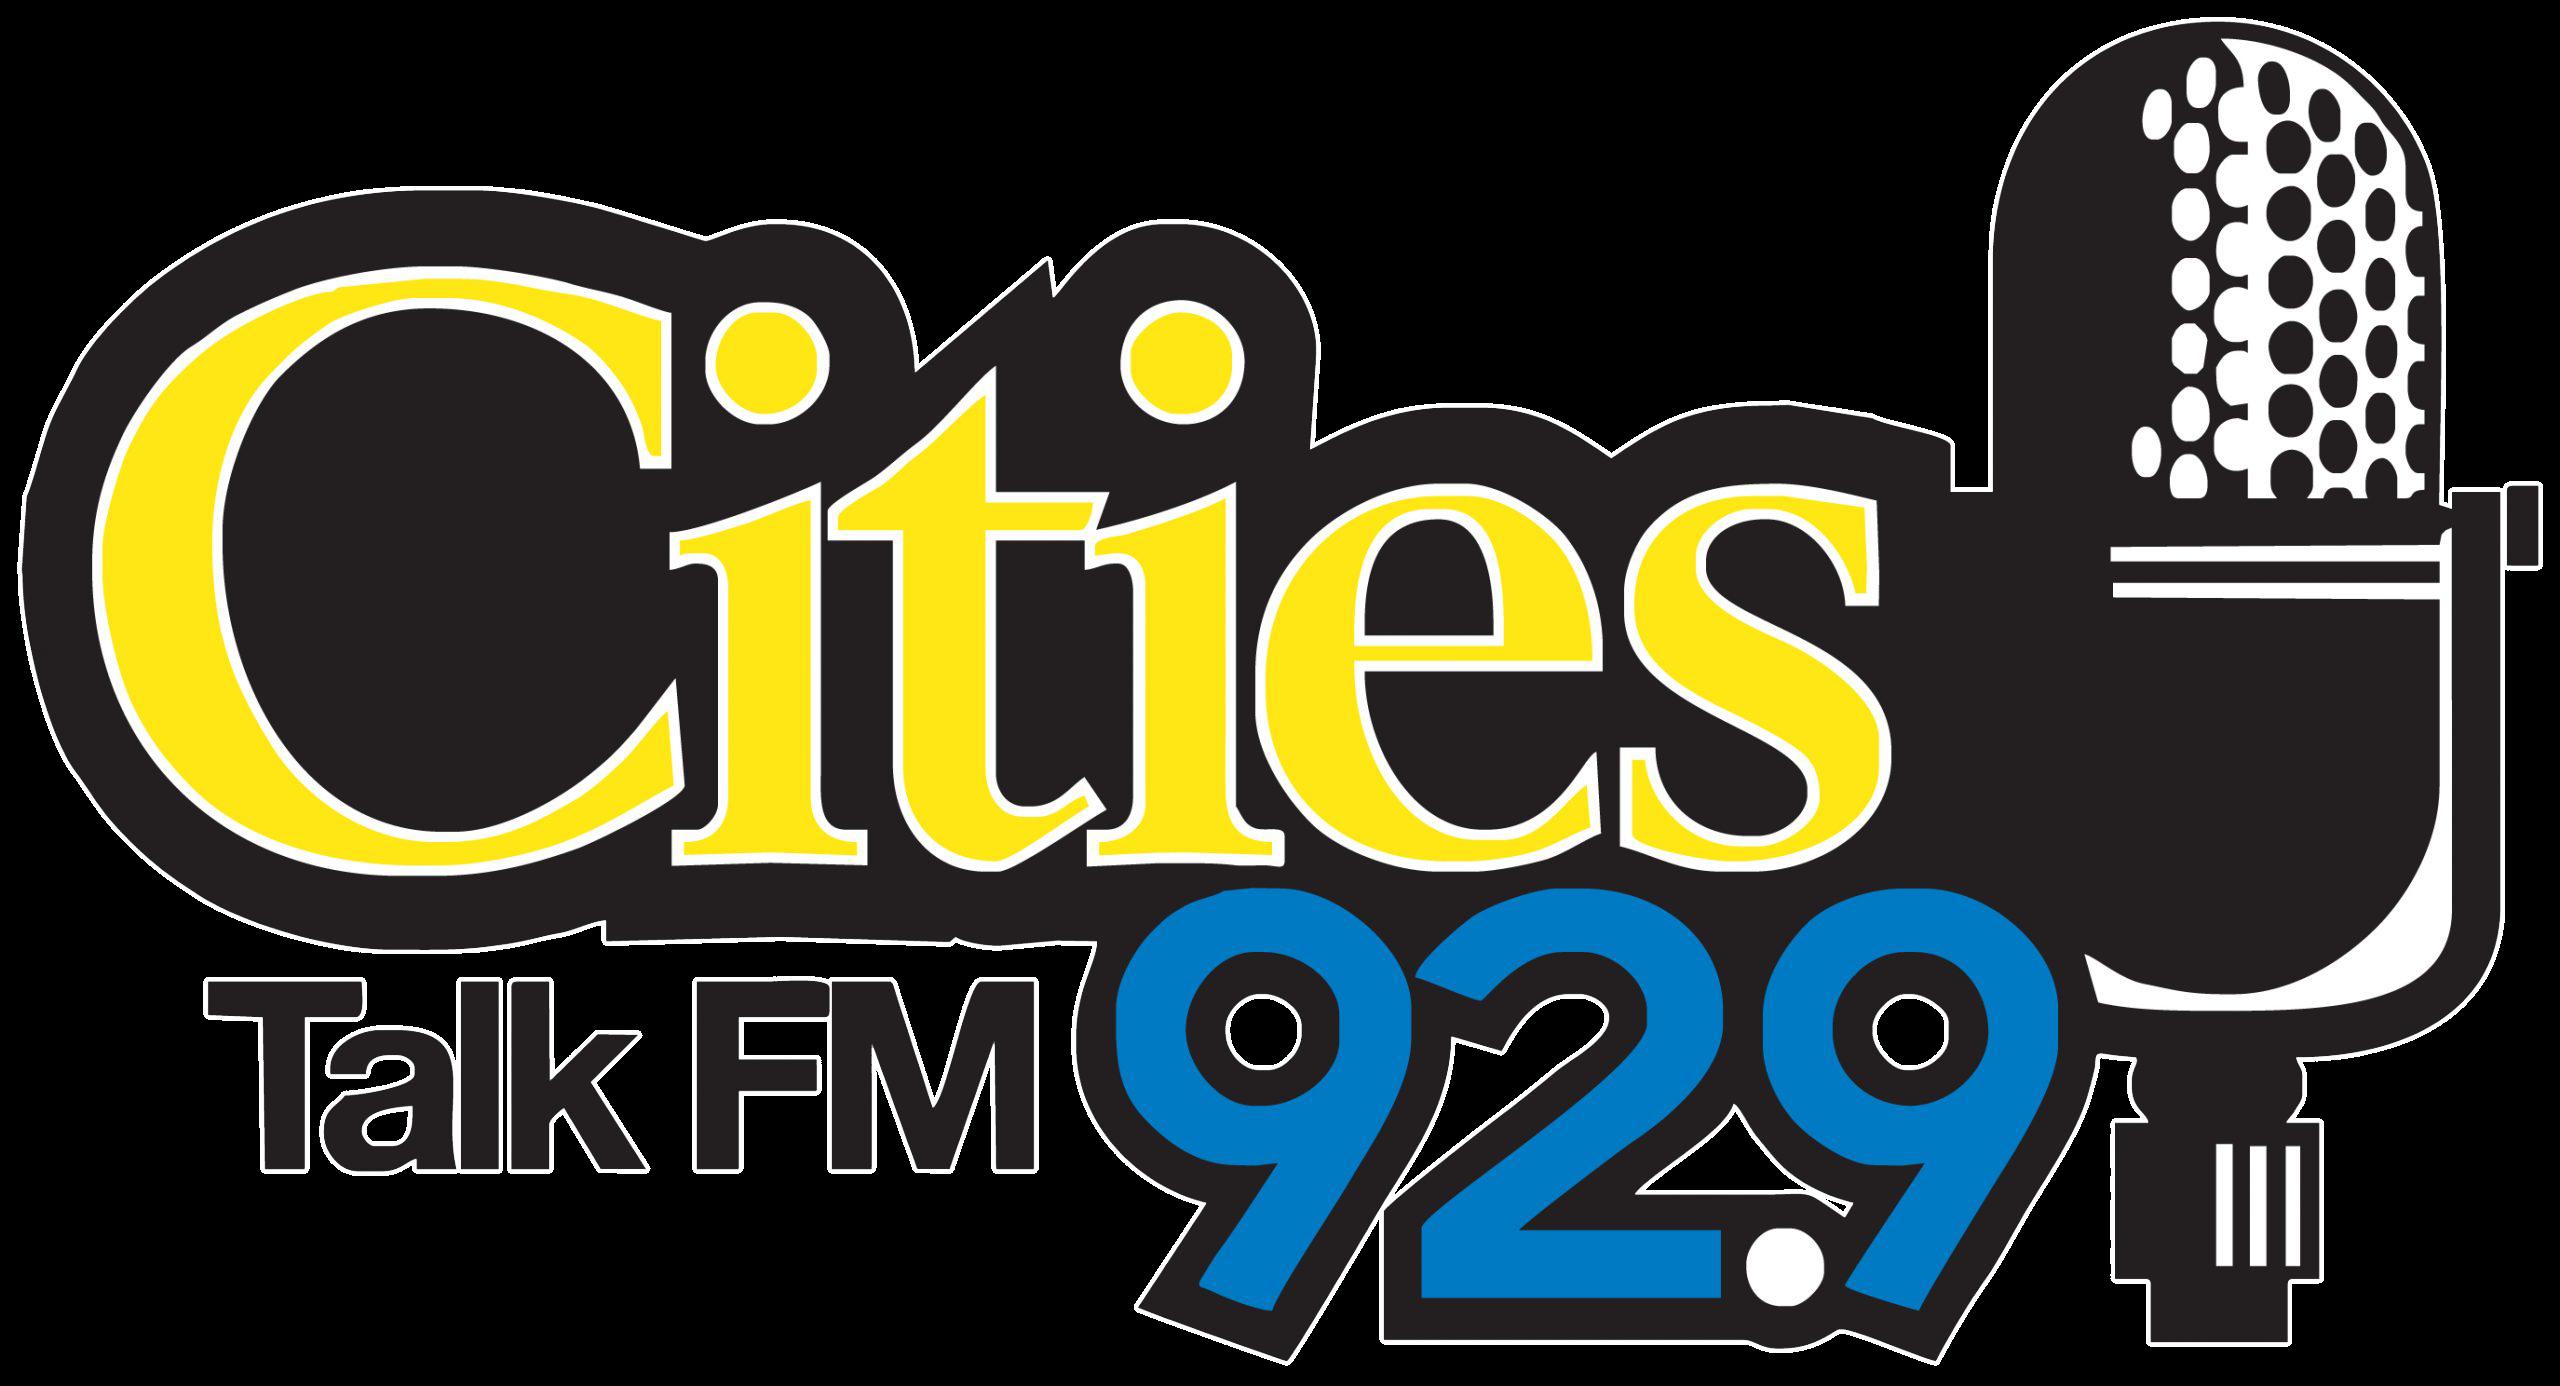 www.cities929.com